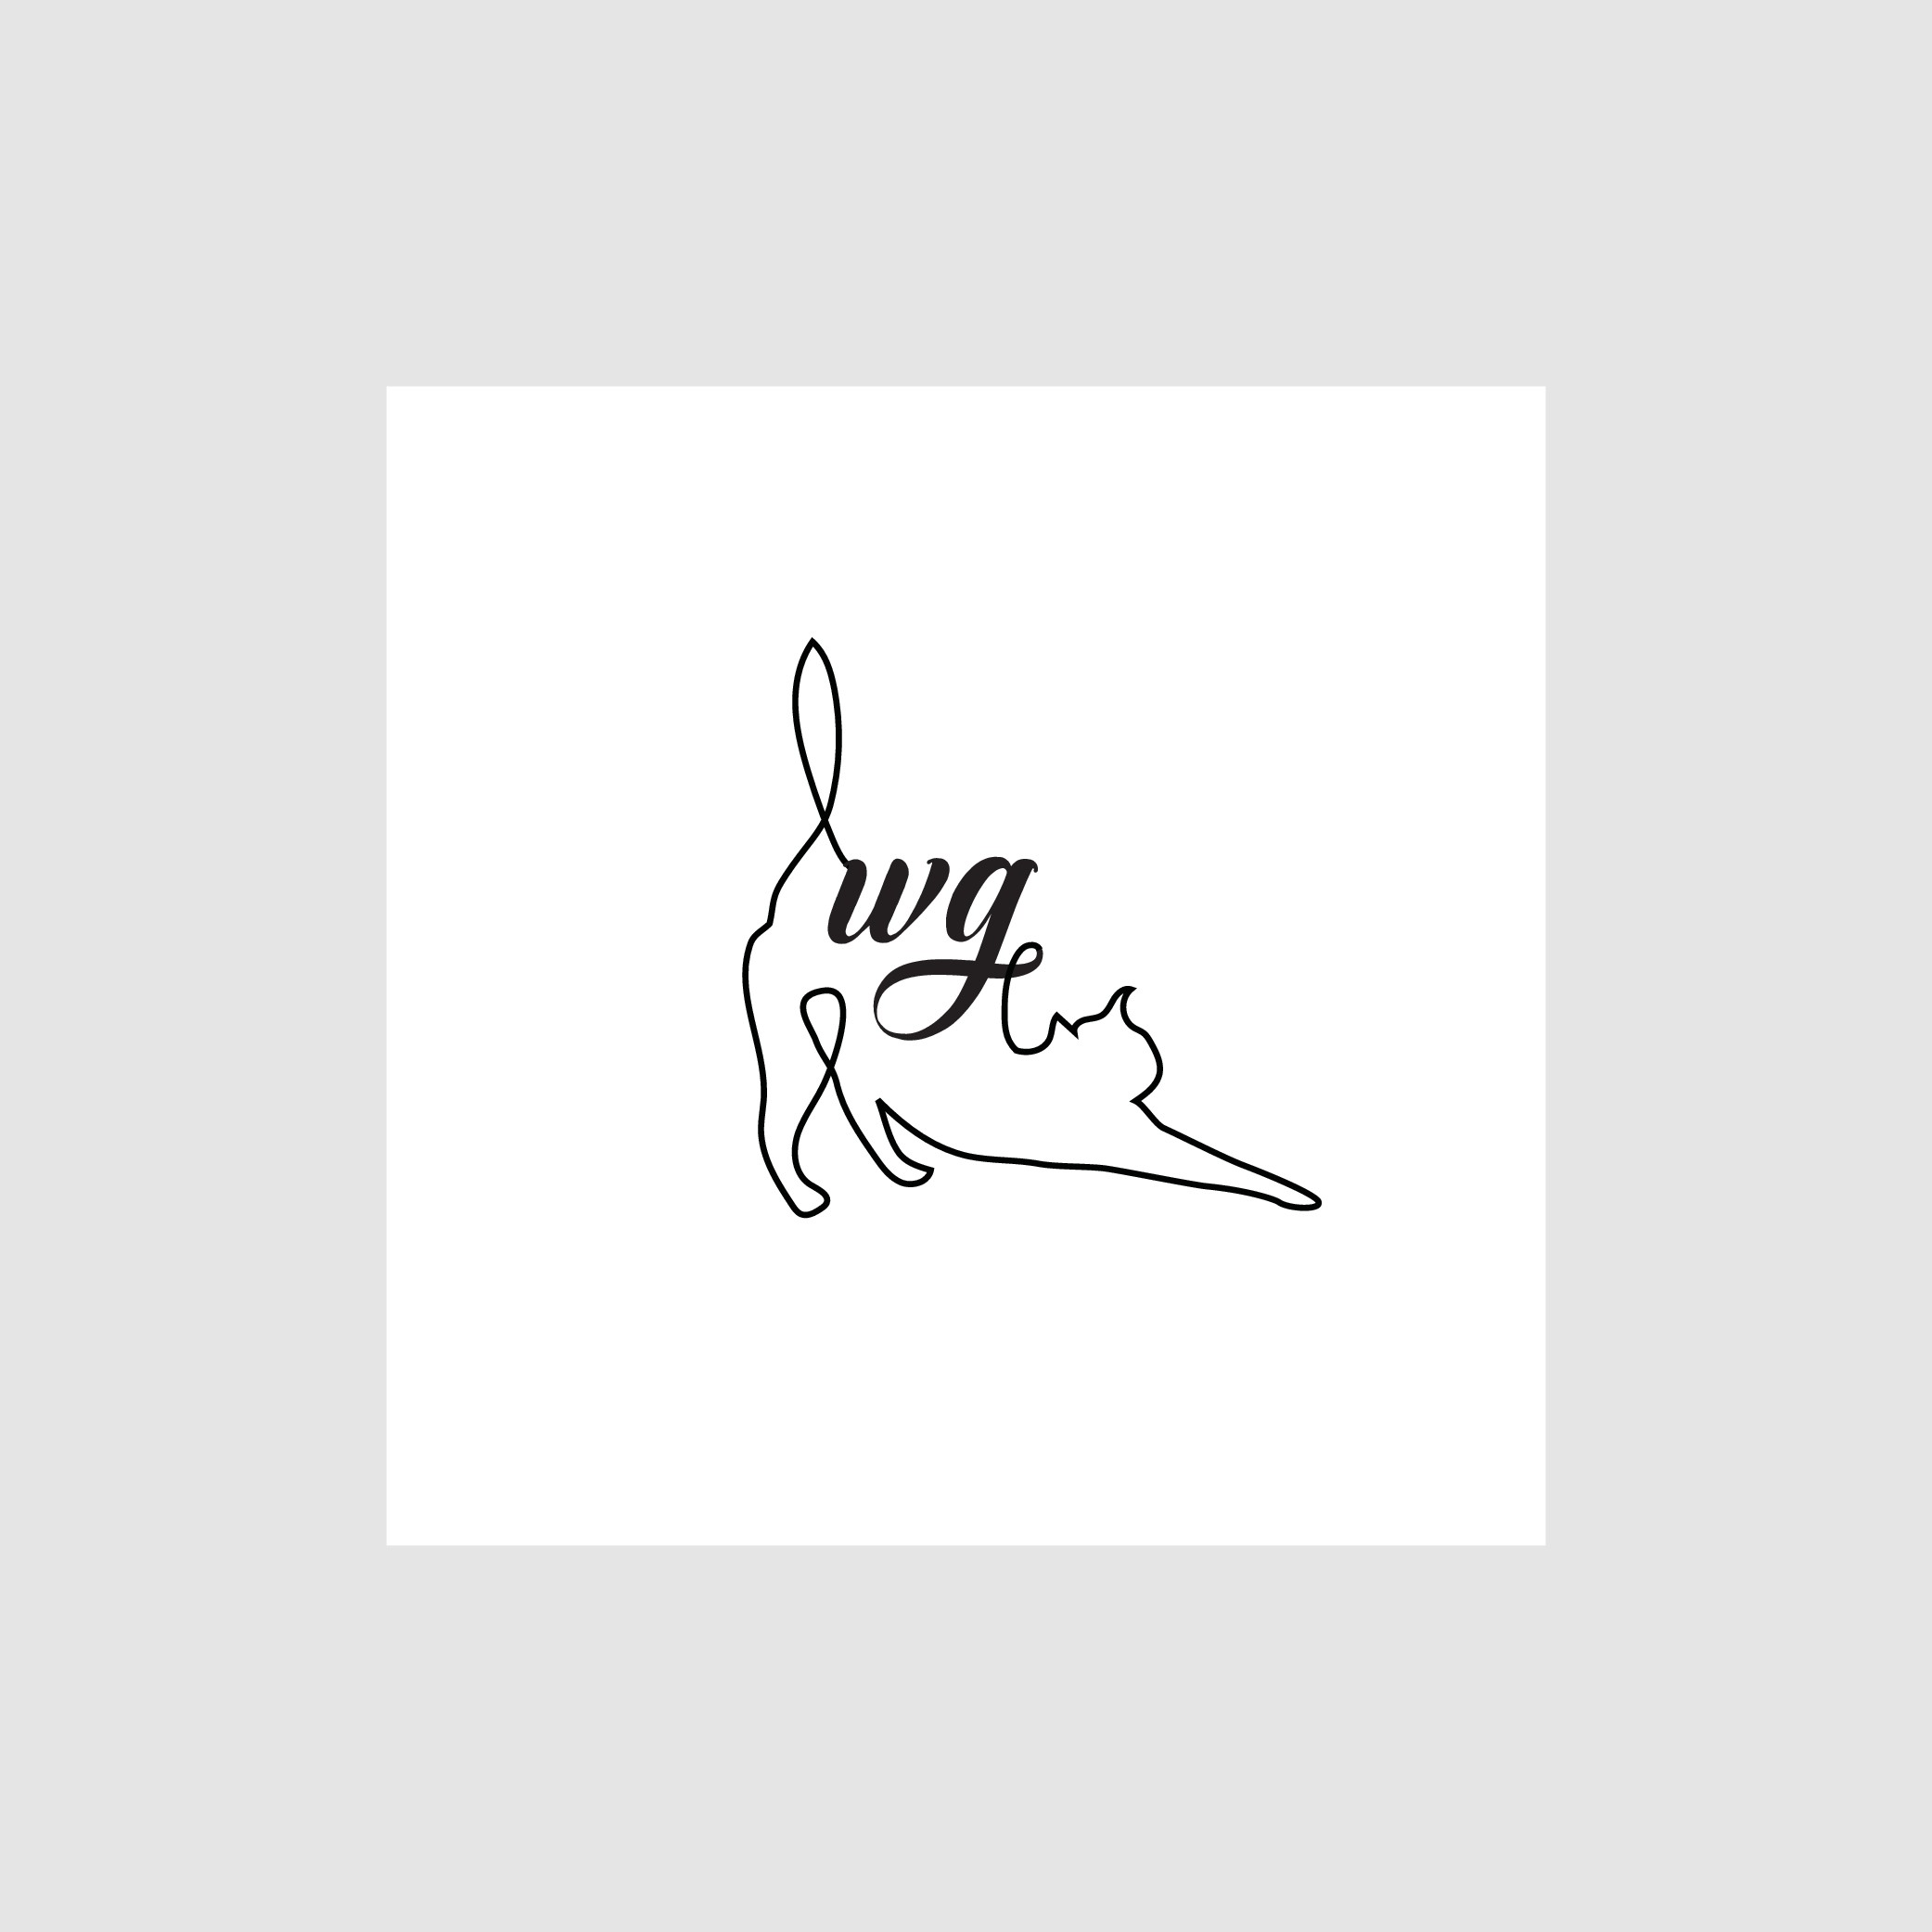 Creative glass artist seeks expressive logo